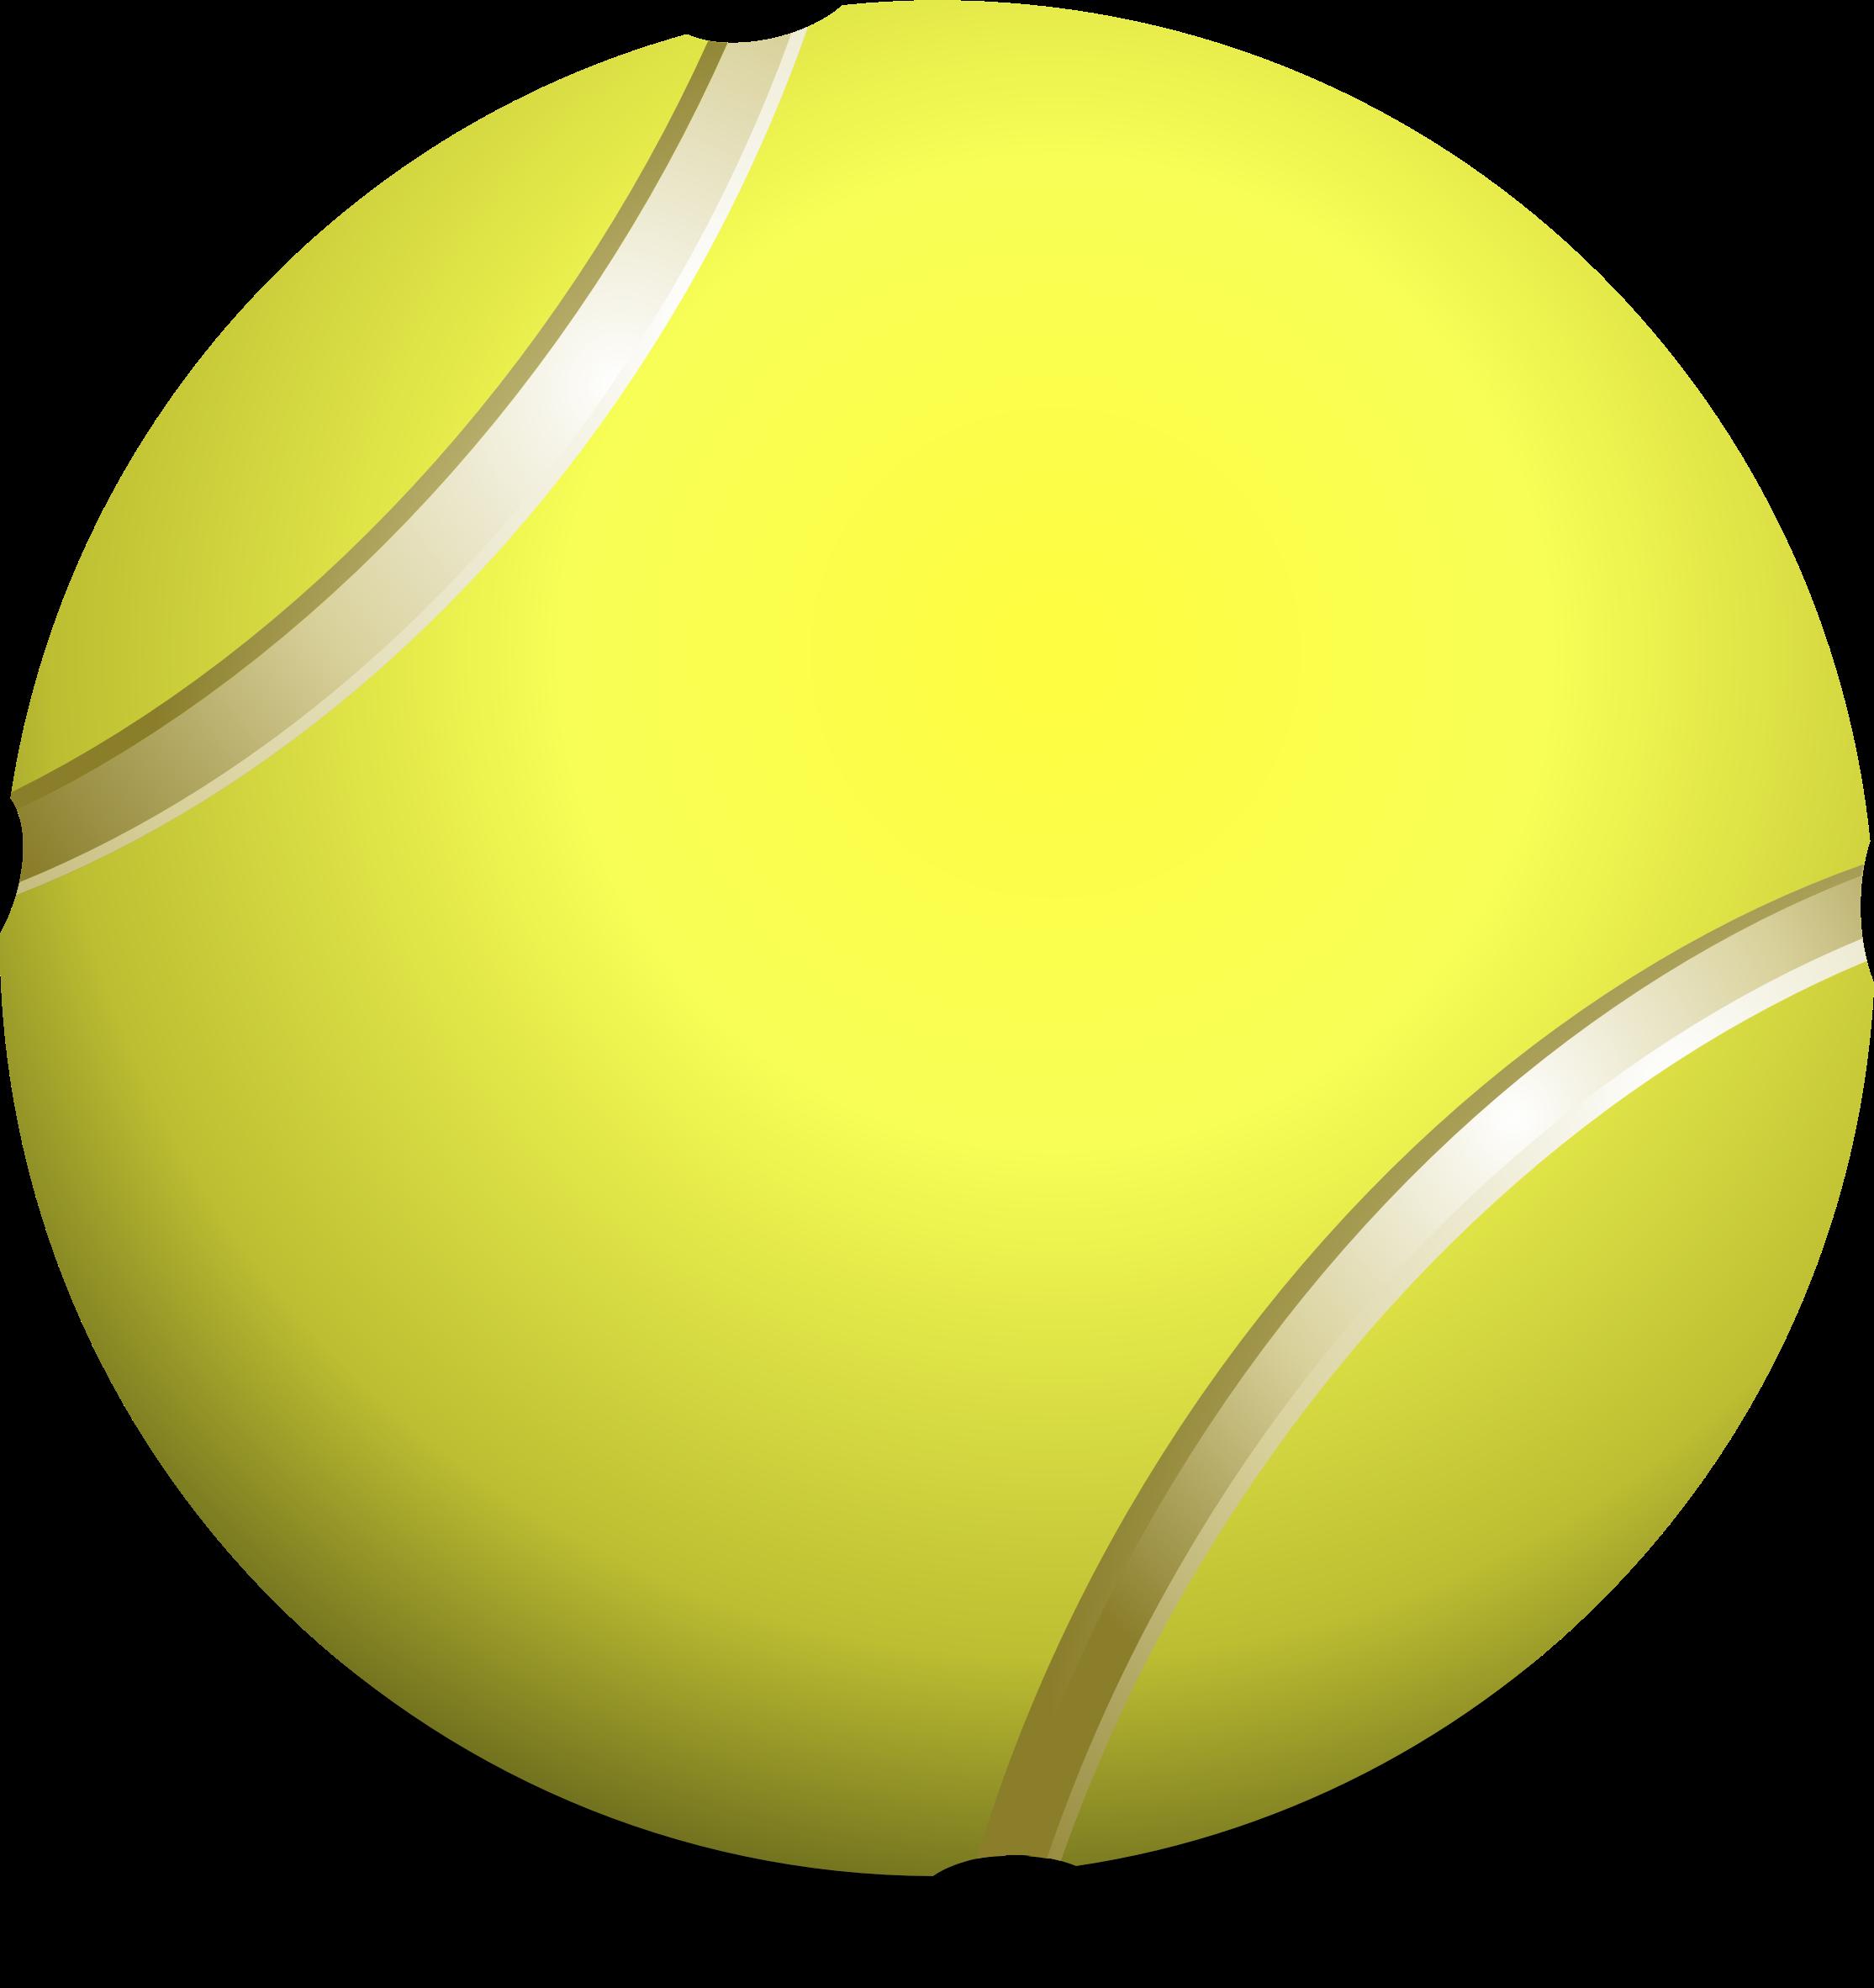 Clipart Tennis Ball Teniso Kamuoliukas-Clipart tennis ball teniso kamuoliukas-6